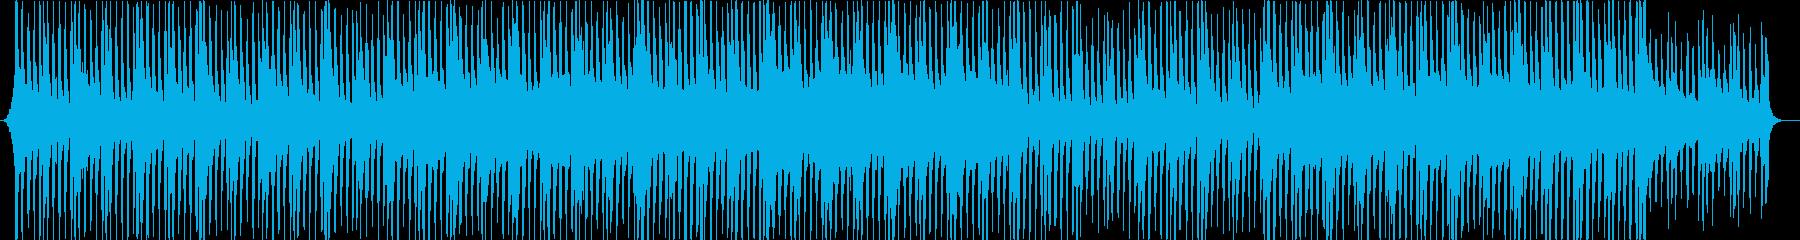 FFボス戦風、疾走感、緊張感戦闘バトルcの再生済みの波形